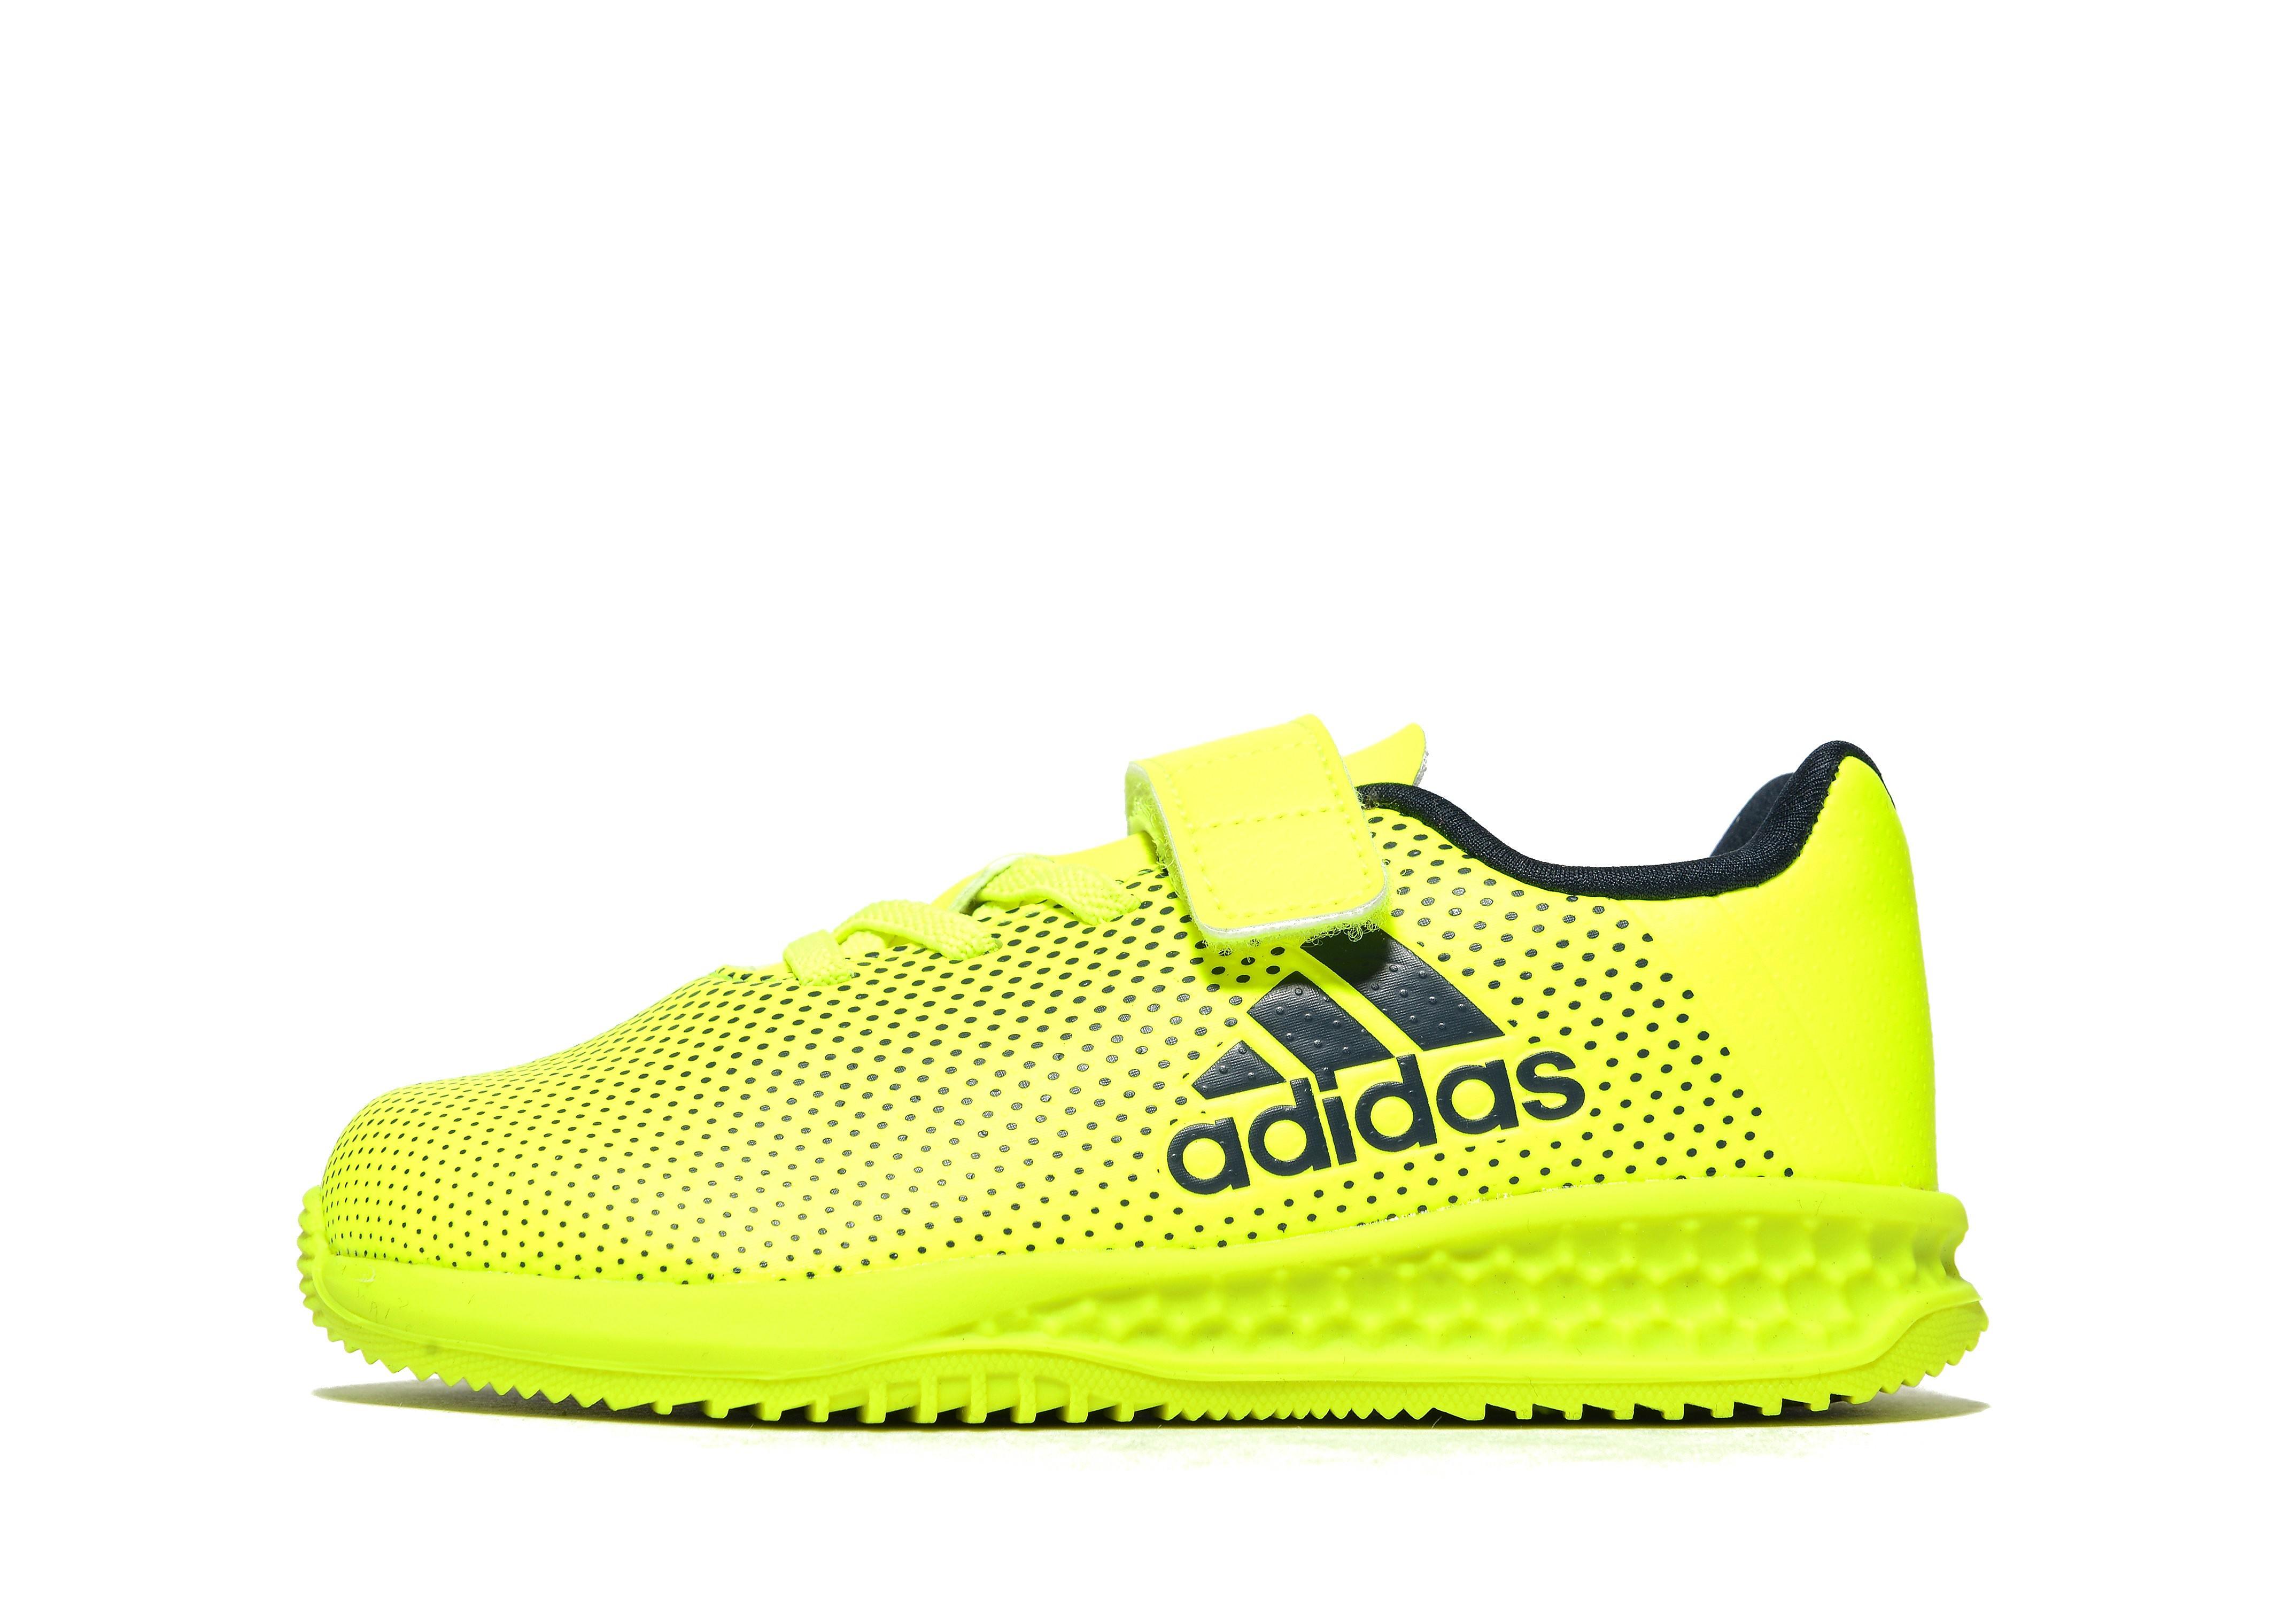 Image de adidas Adidas Rapidaturf X Enfant - Yellow/Black, Yellow/Black